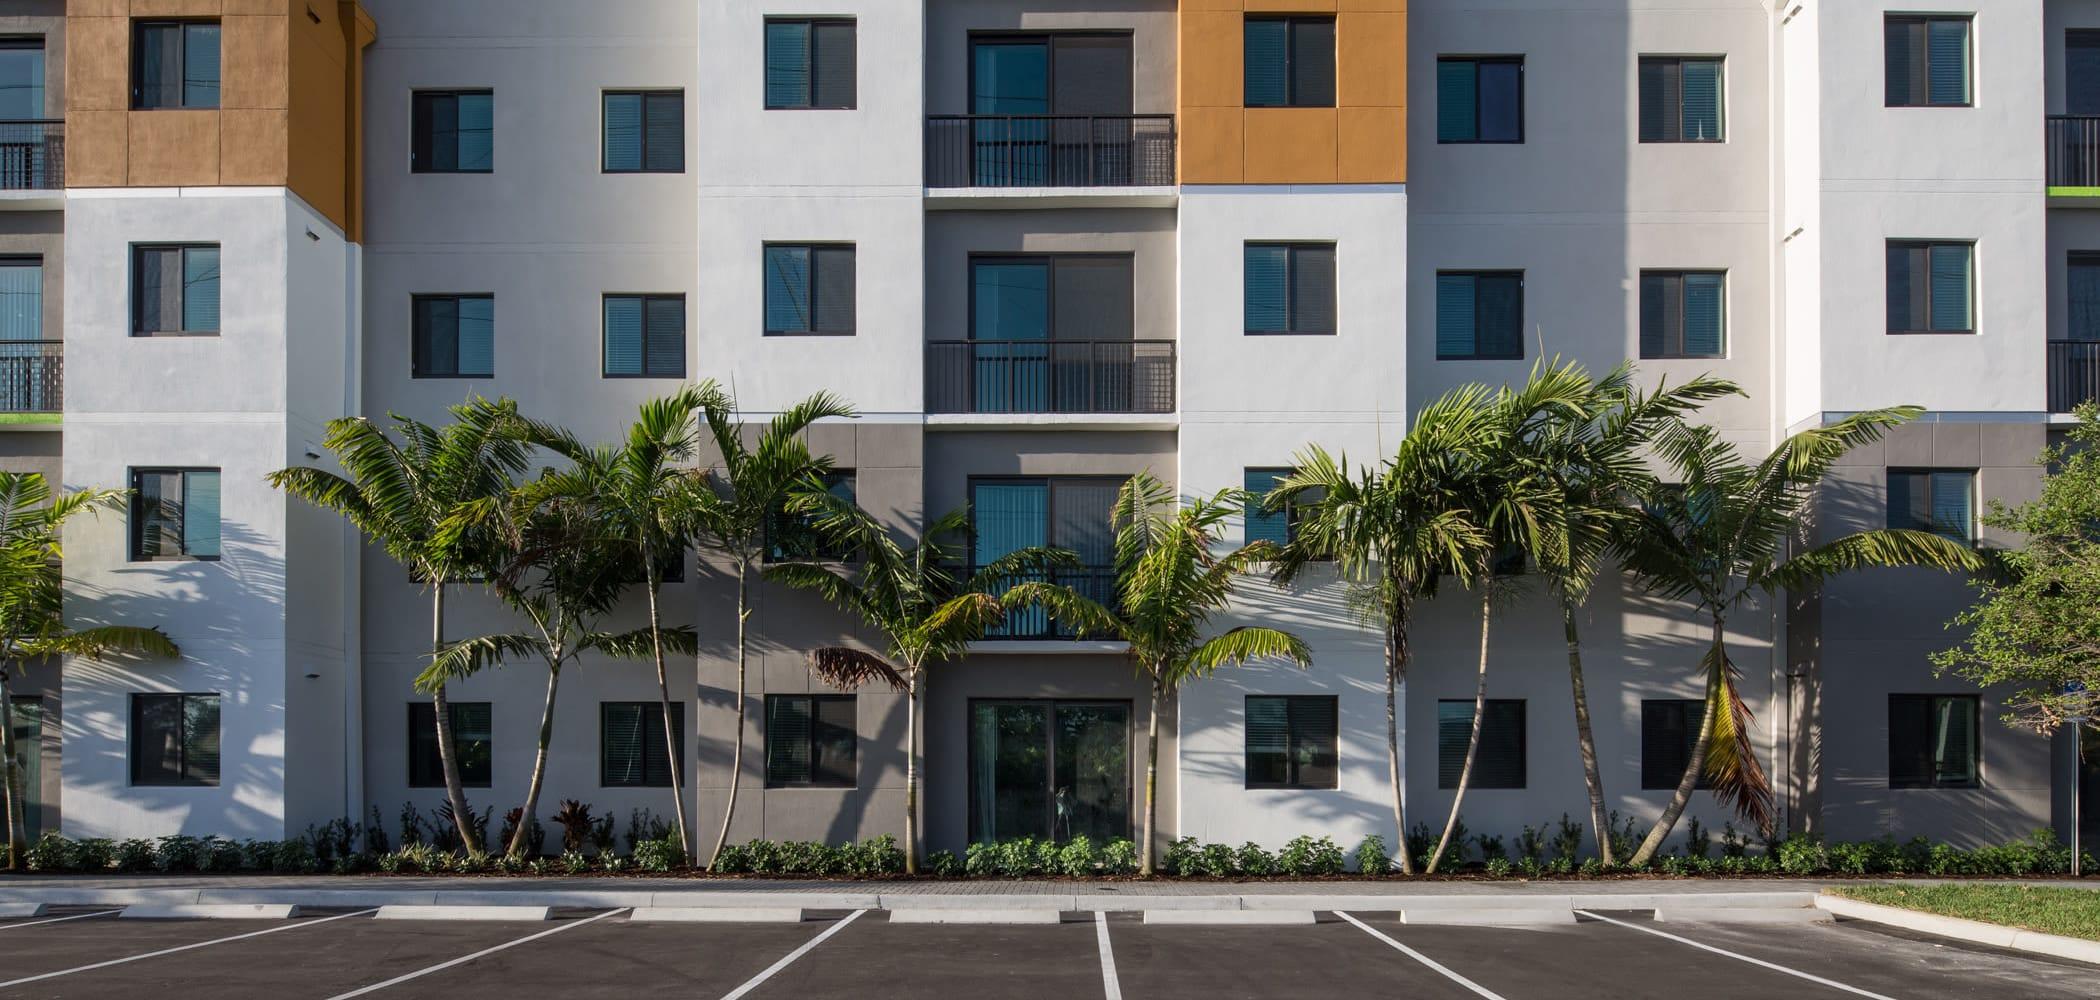 Exterior building and parking lot at University Park in Boca Raton, Florida